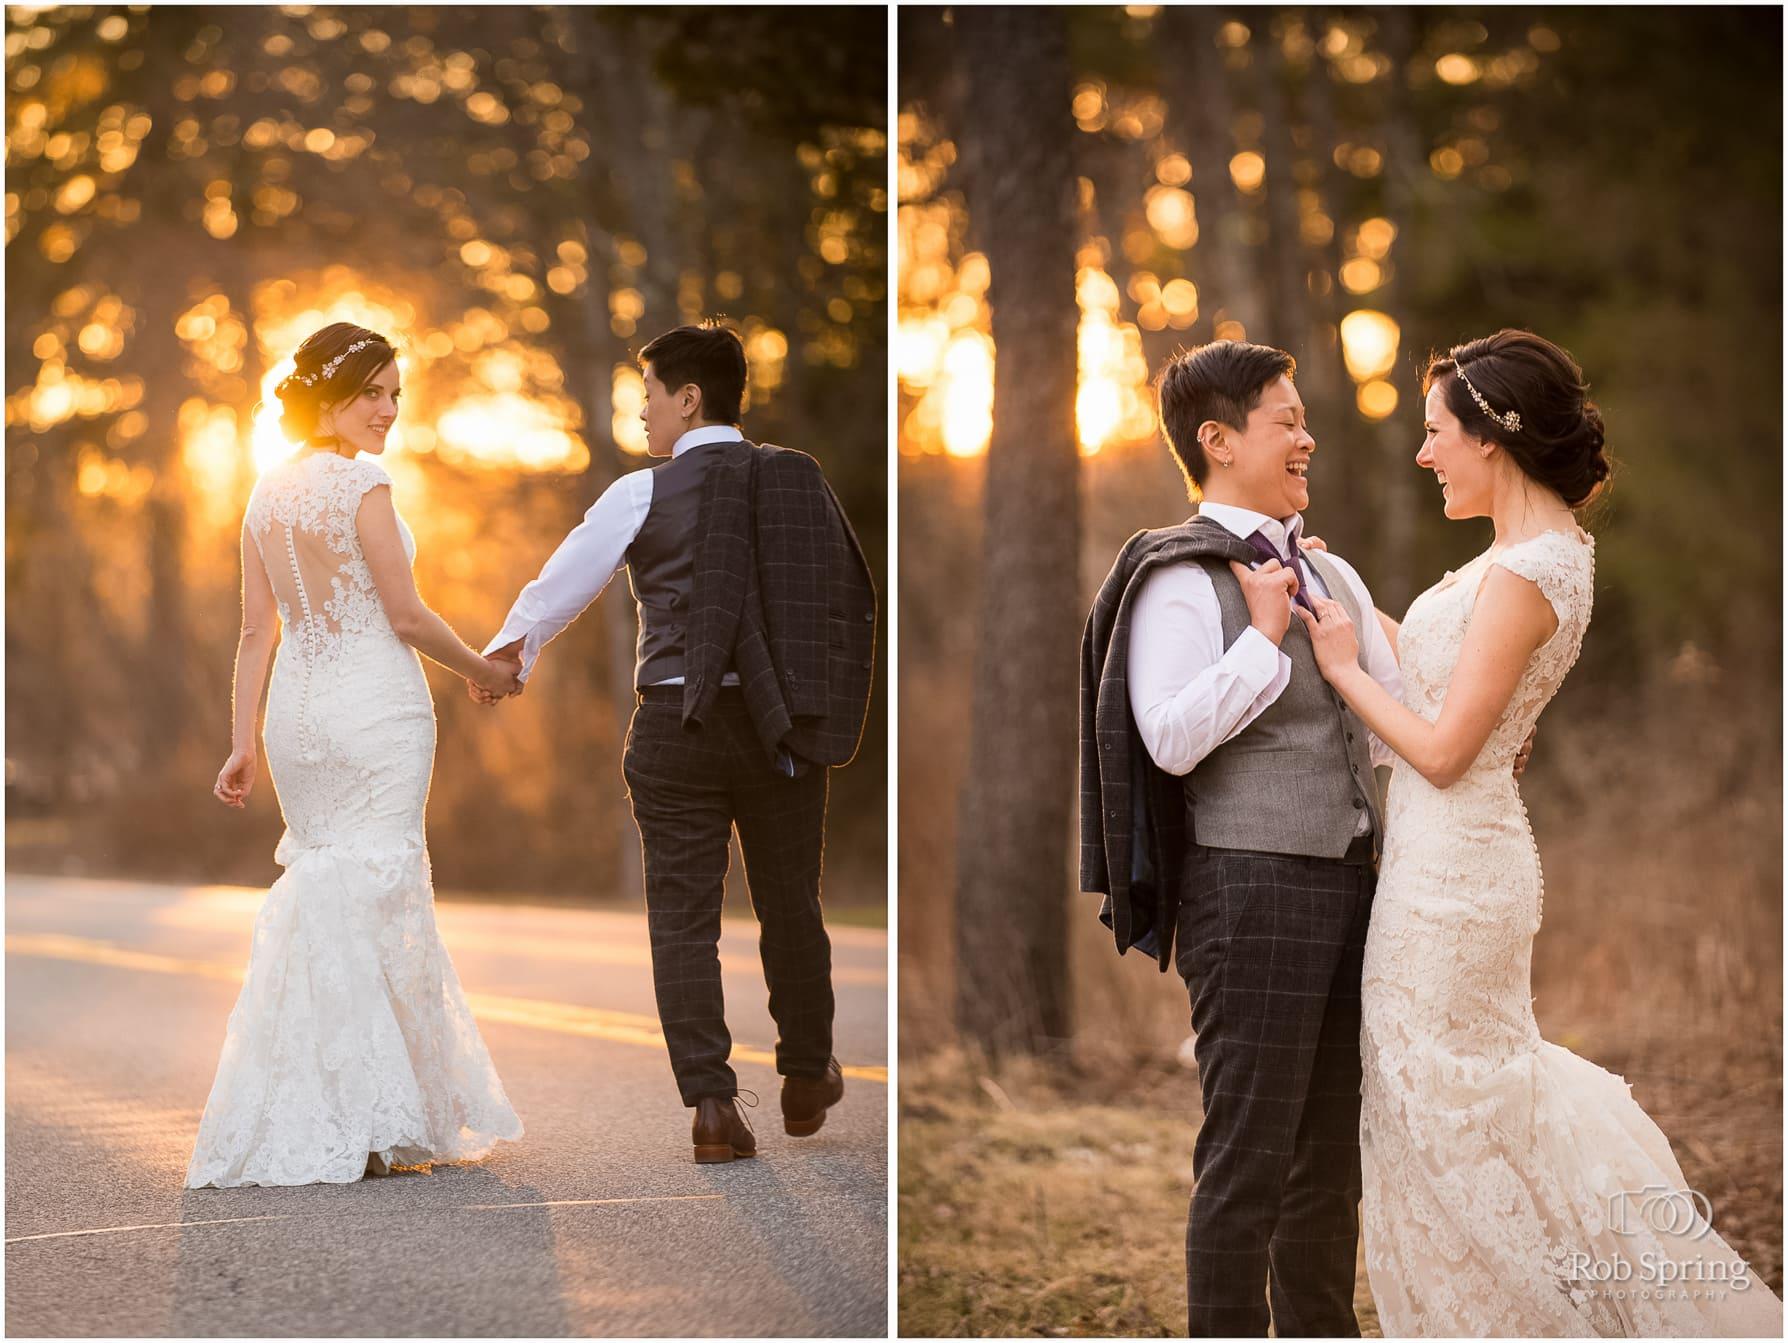 Rob Spring Photography Saratoga Springs Wedding Photographer